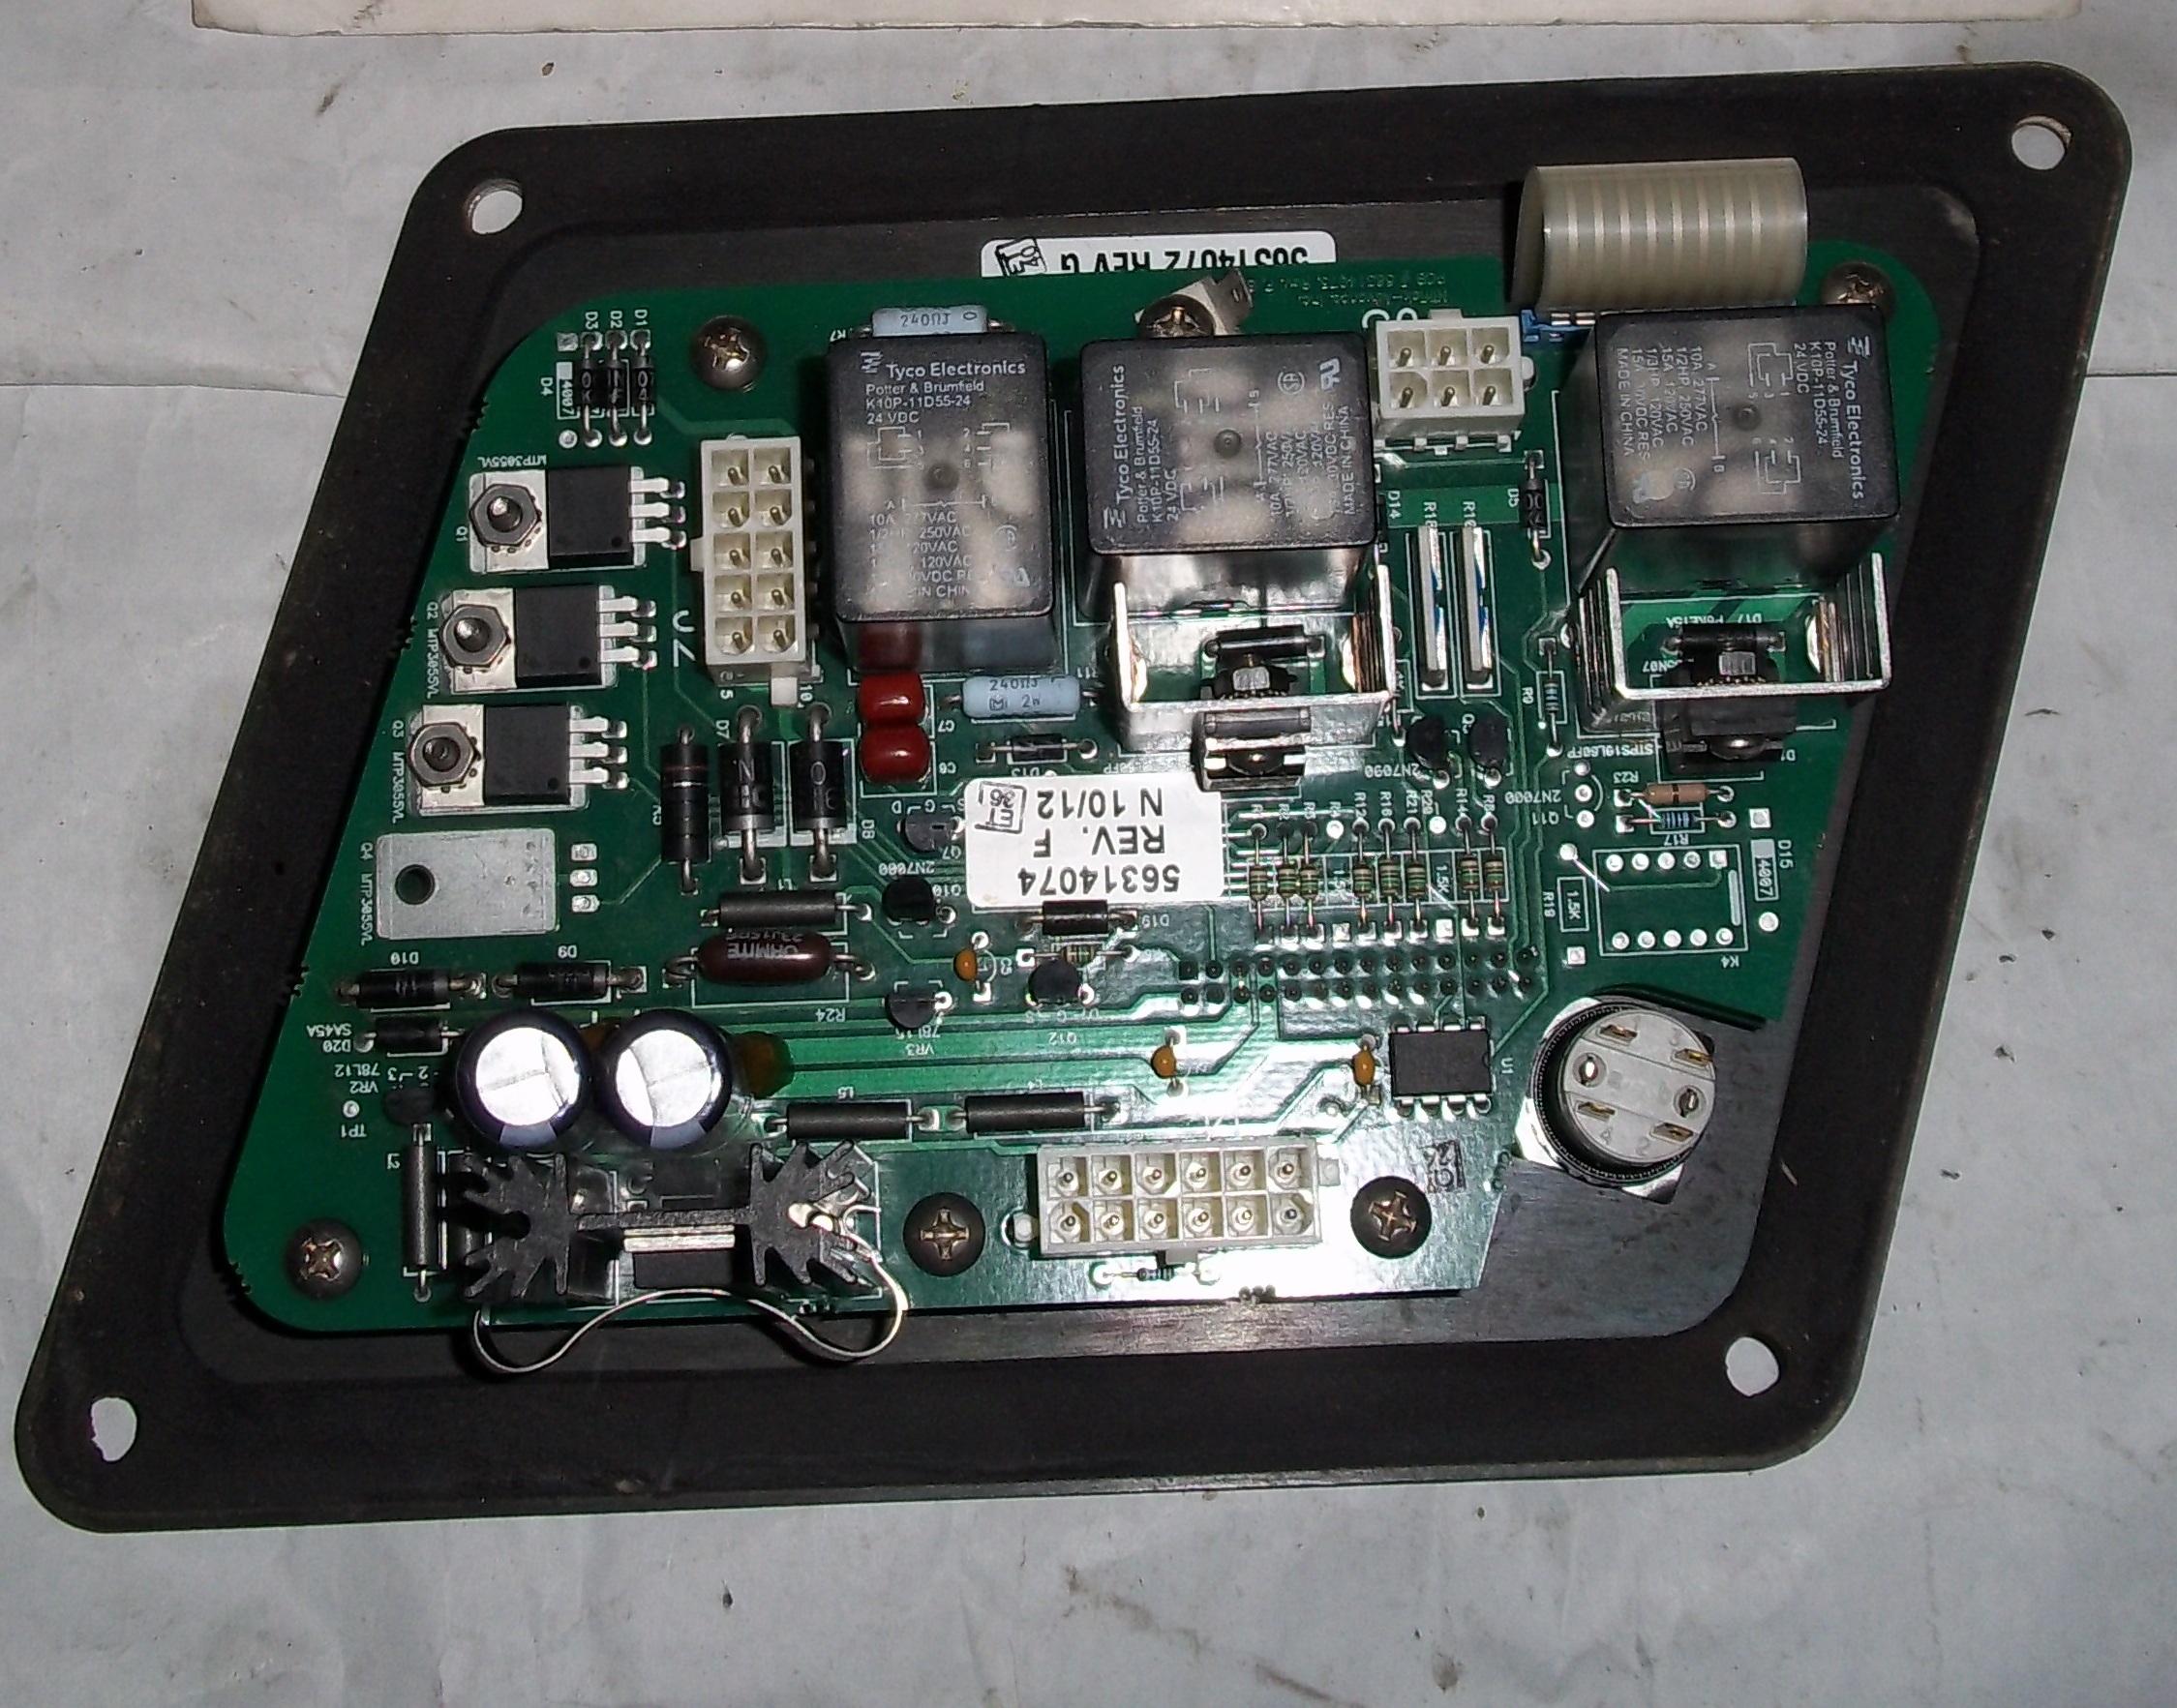 Repair 56314074 BOSCH RKP  CONTROL PANEL (56314074) in Malaysia, Singapore, Thailand, Indonesia